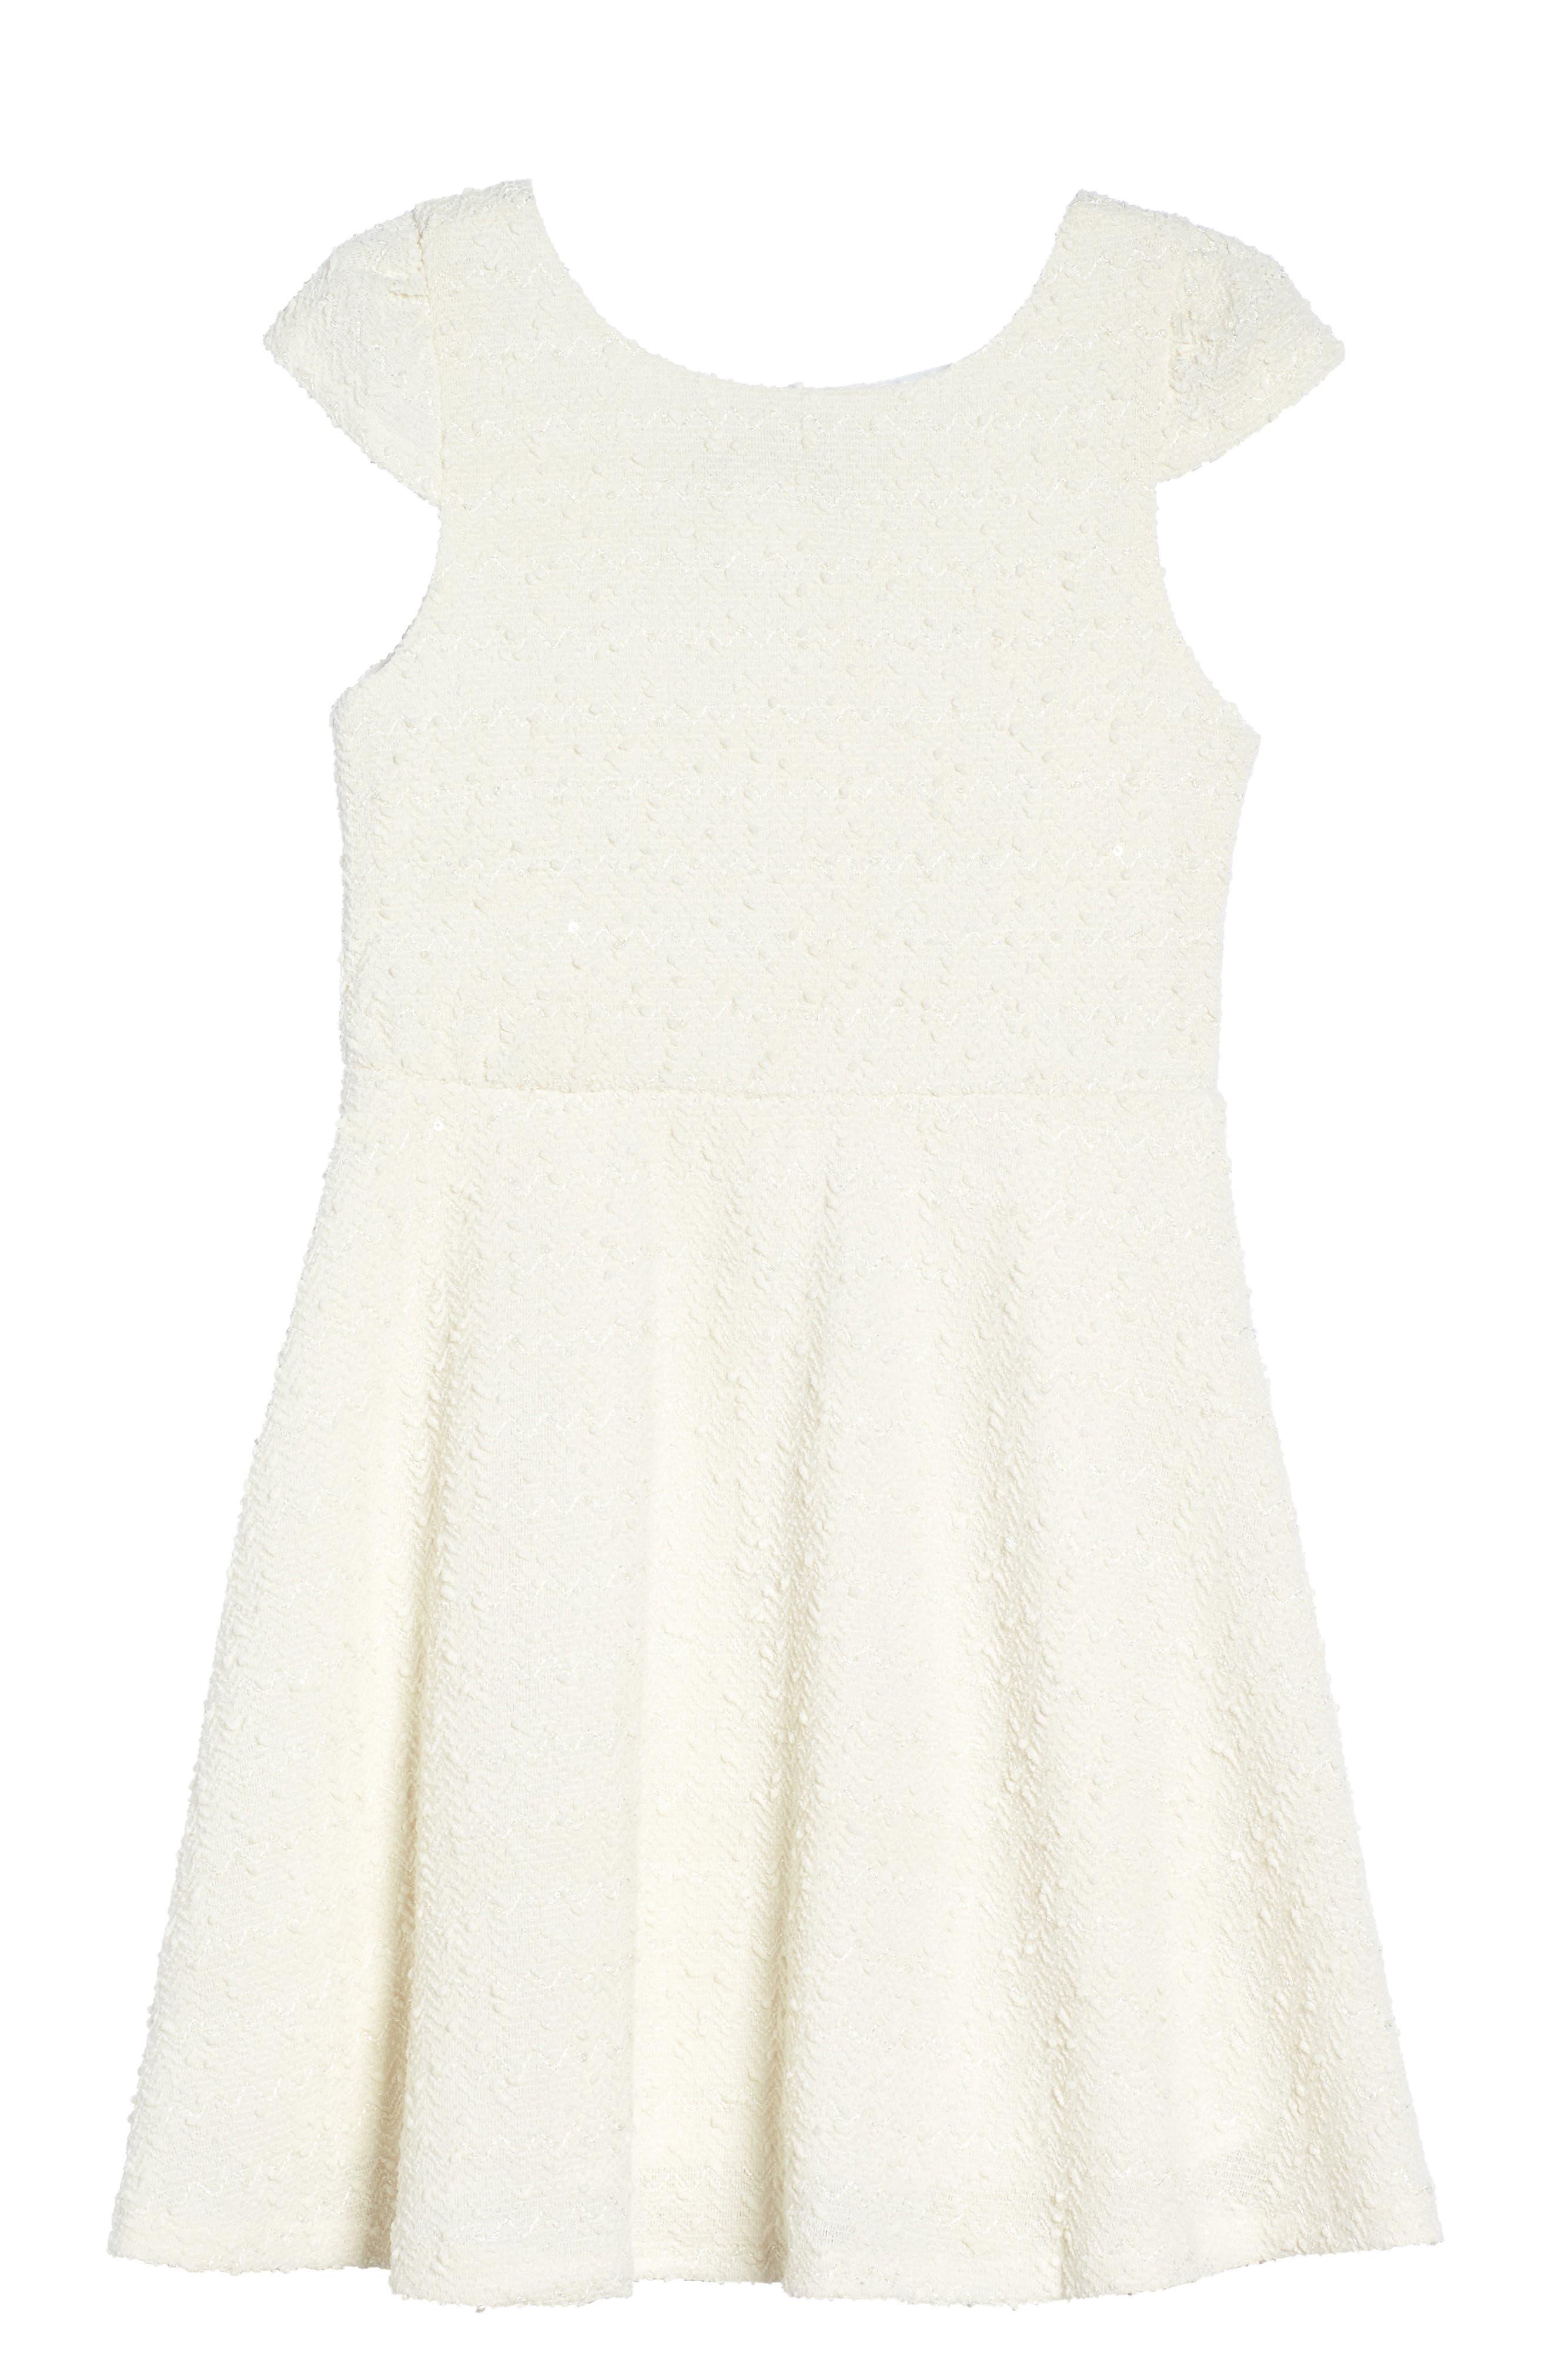 Carly Cap Sleeve Dress,                             Alternate thumbnail 2, color,                             250